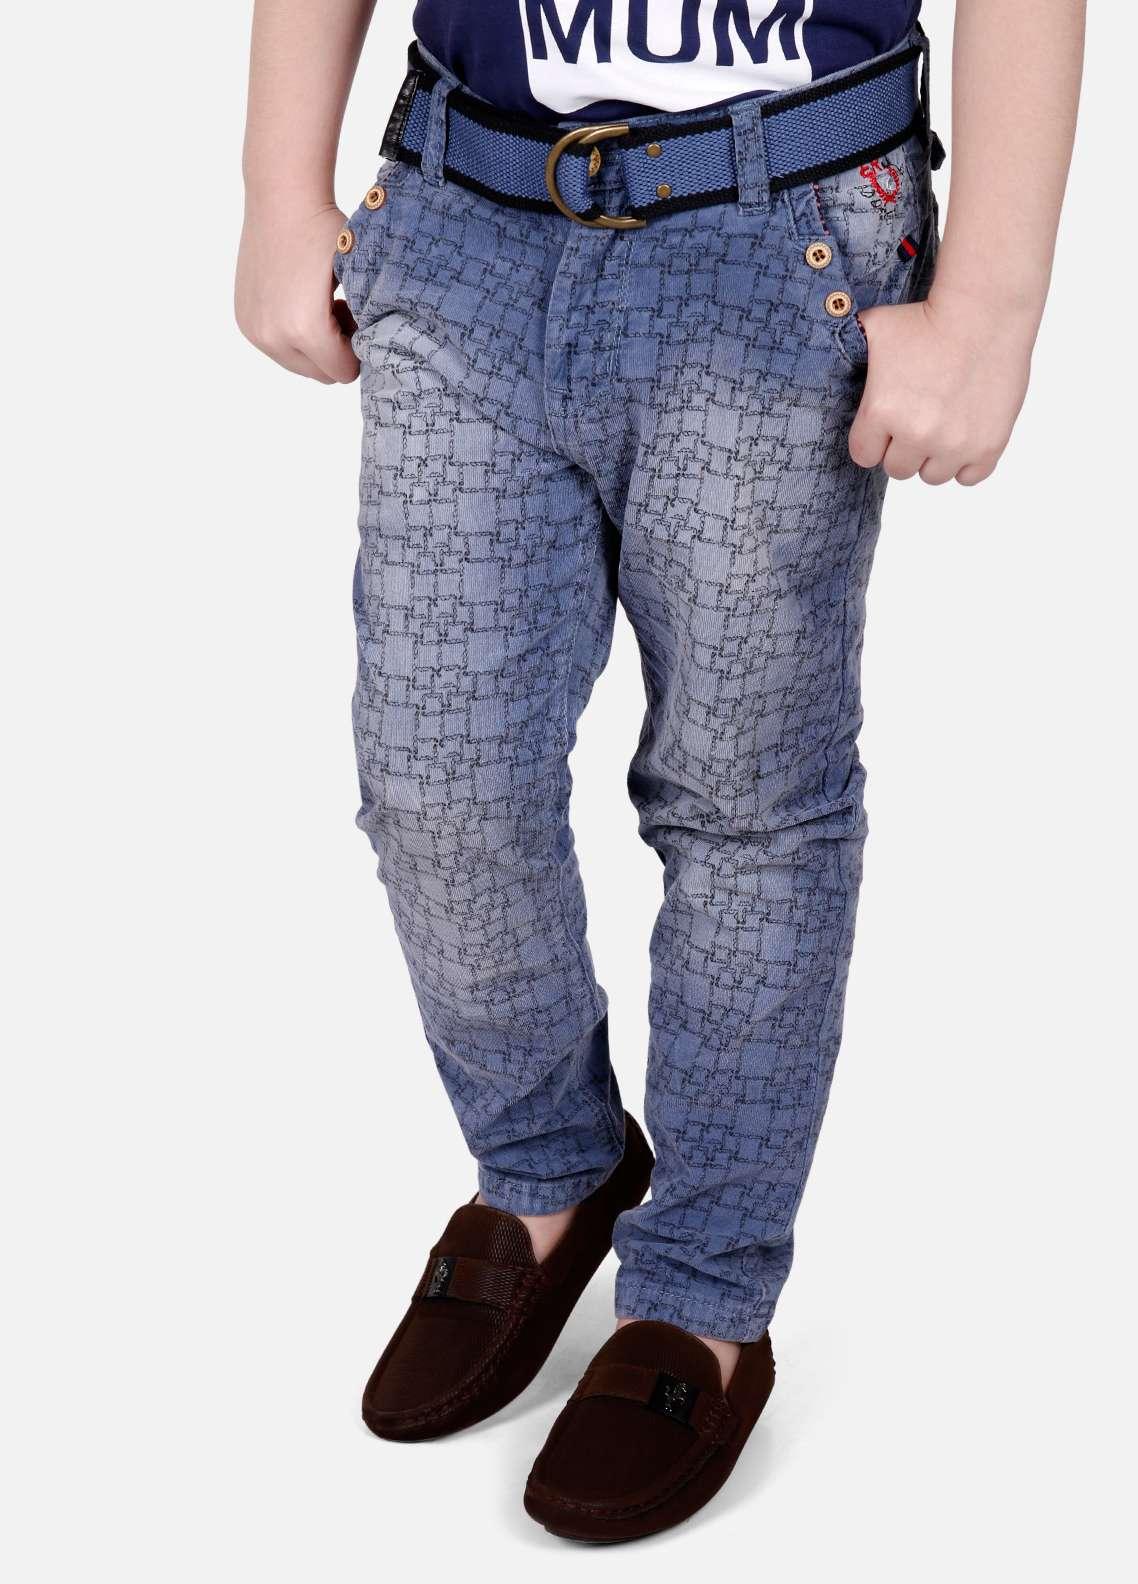 Edenrobe Jeans Faded Boys Pants - Blue EDK18P 5713